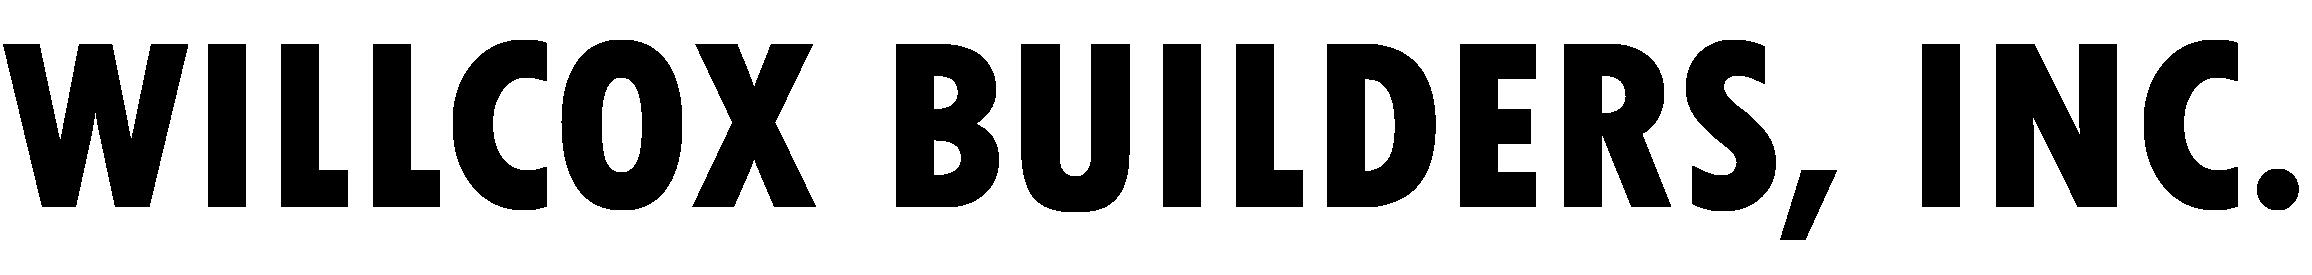 Willcox Builders, Inc Logo_Vector_B&W